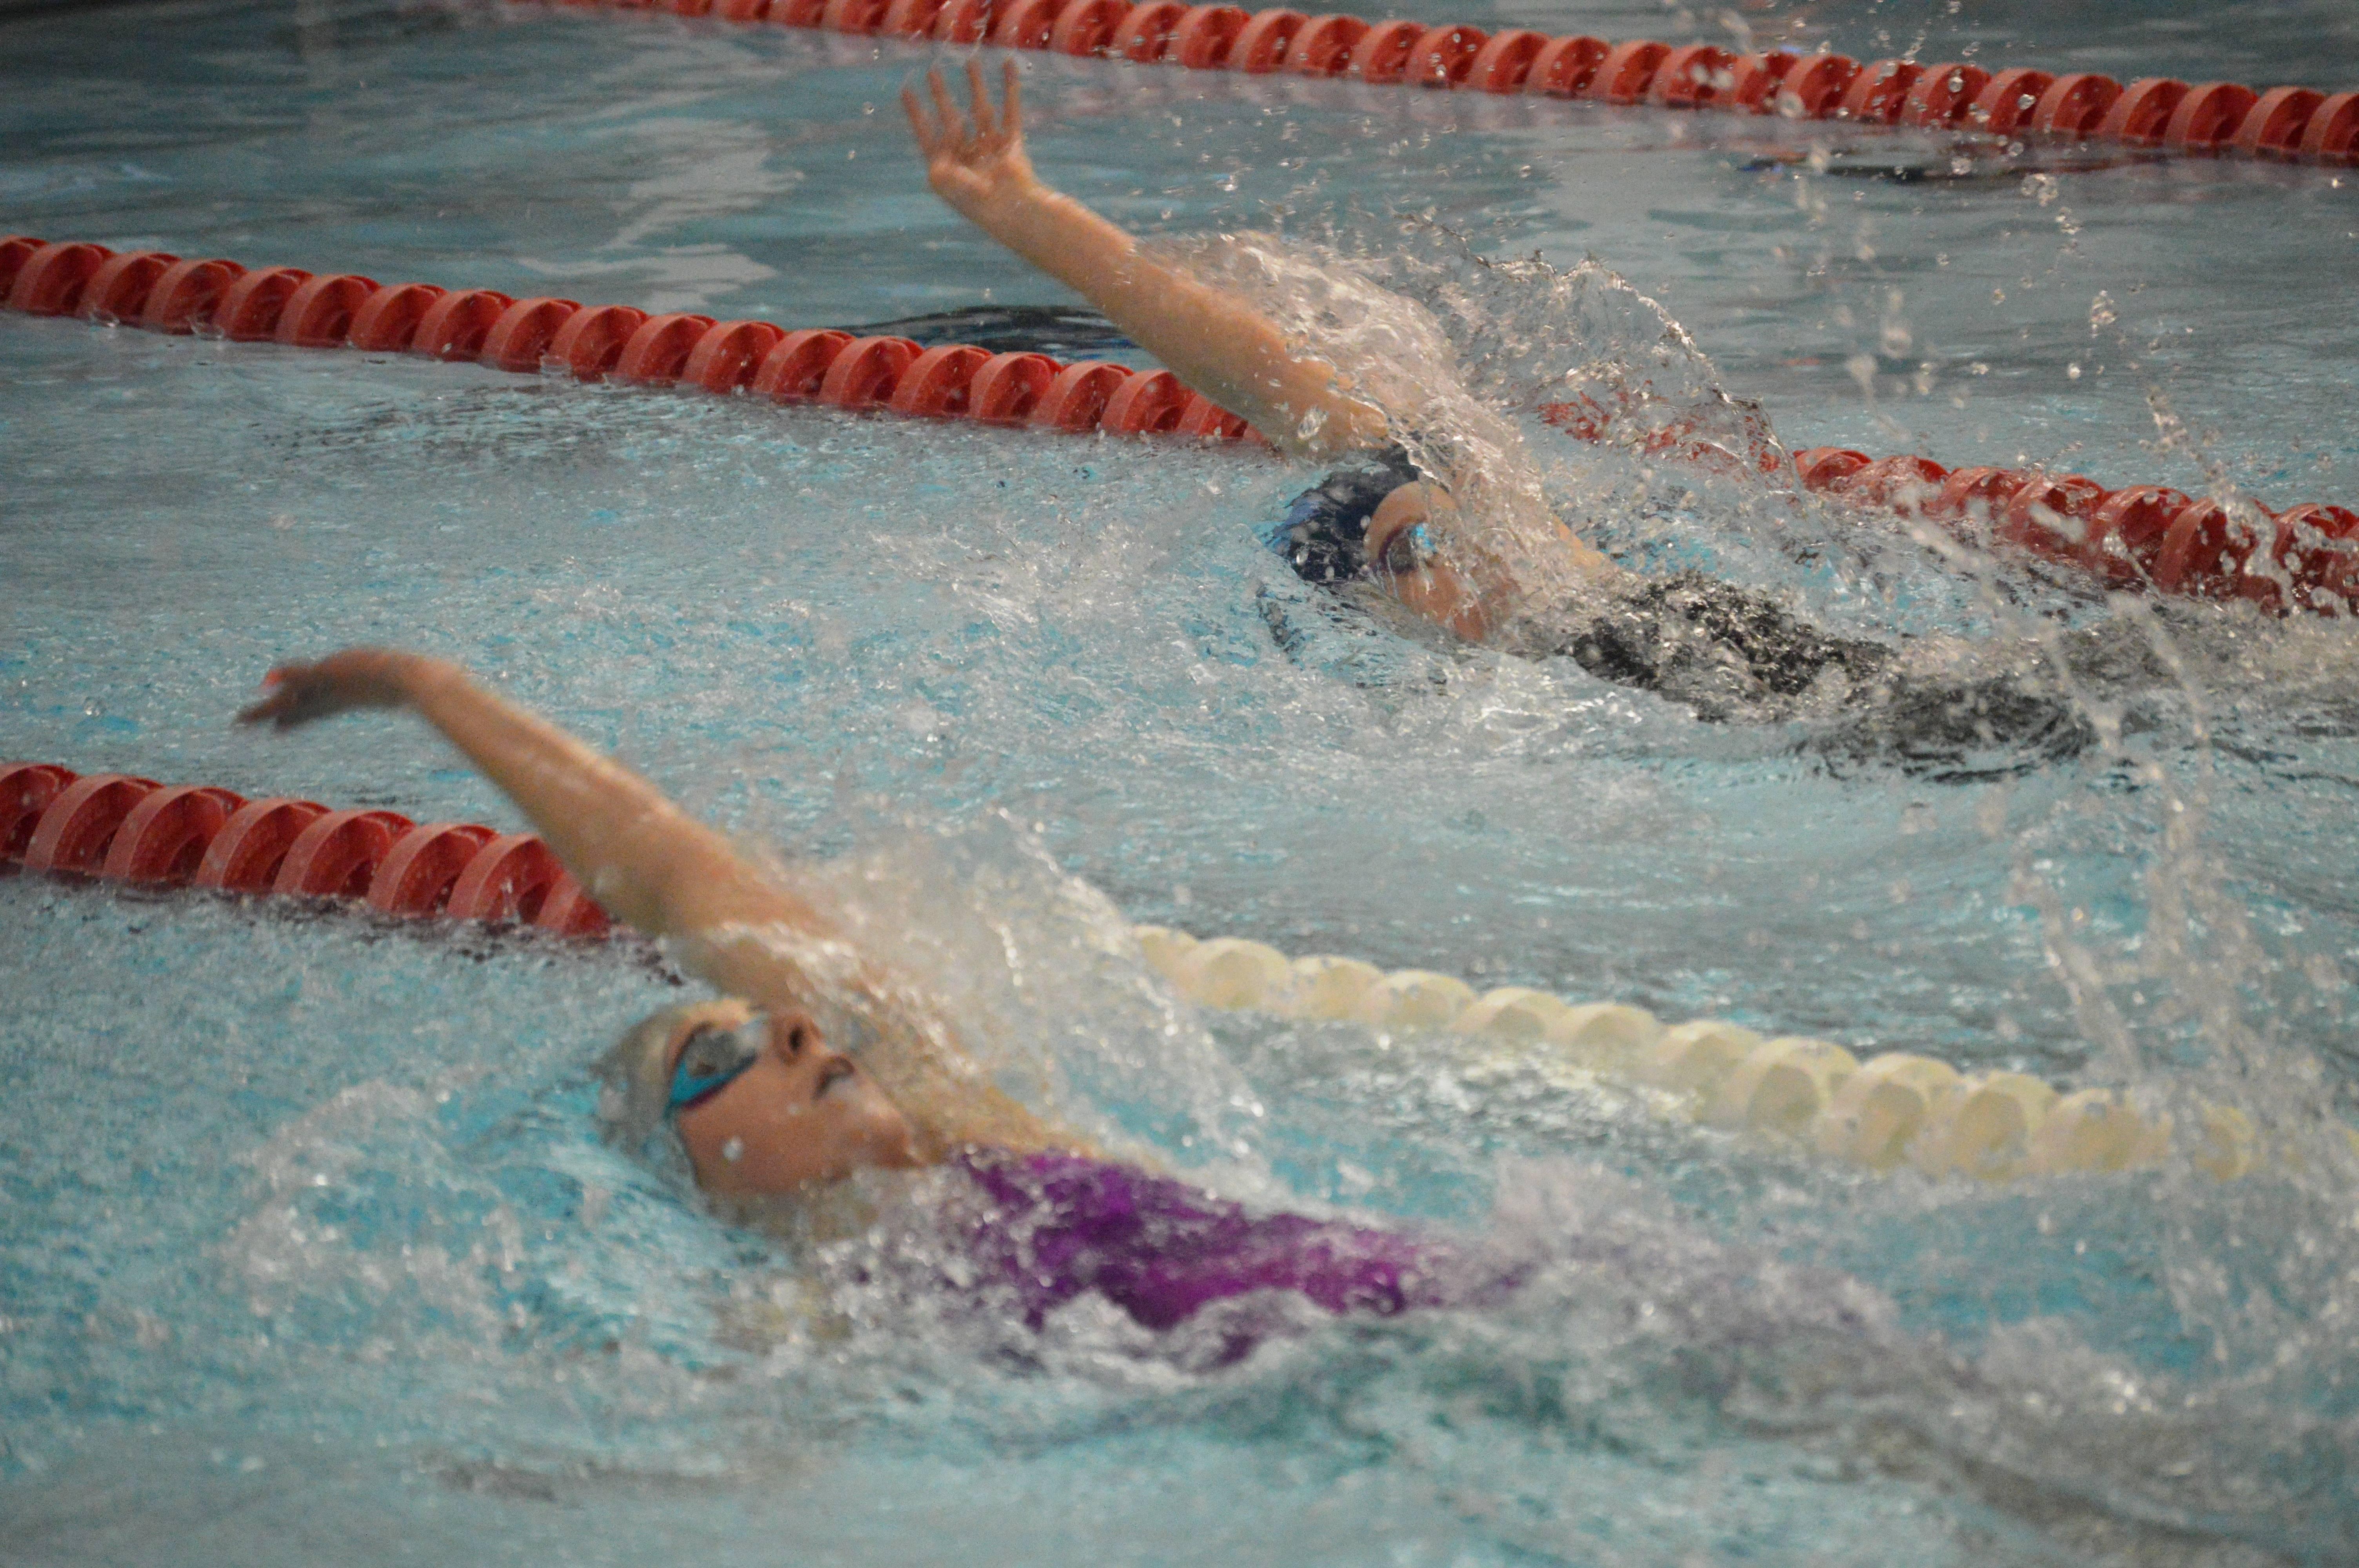 2c9bc97d774ad9a72937_1-10-17_girls_backstroke_race.JPG